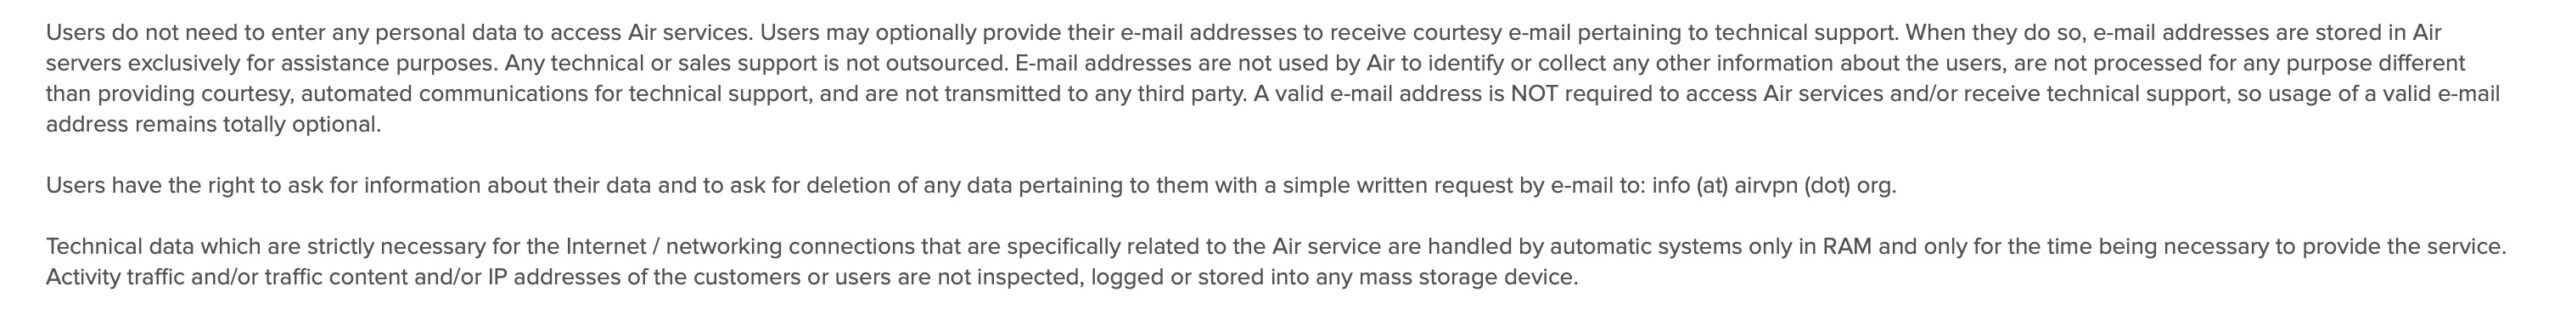 AirVPN - Privacy Policy 2